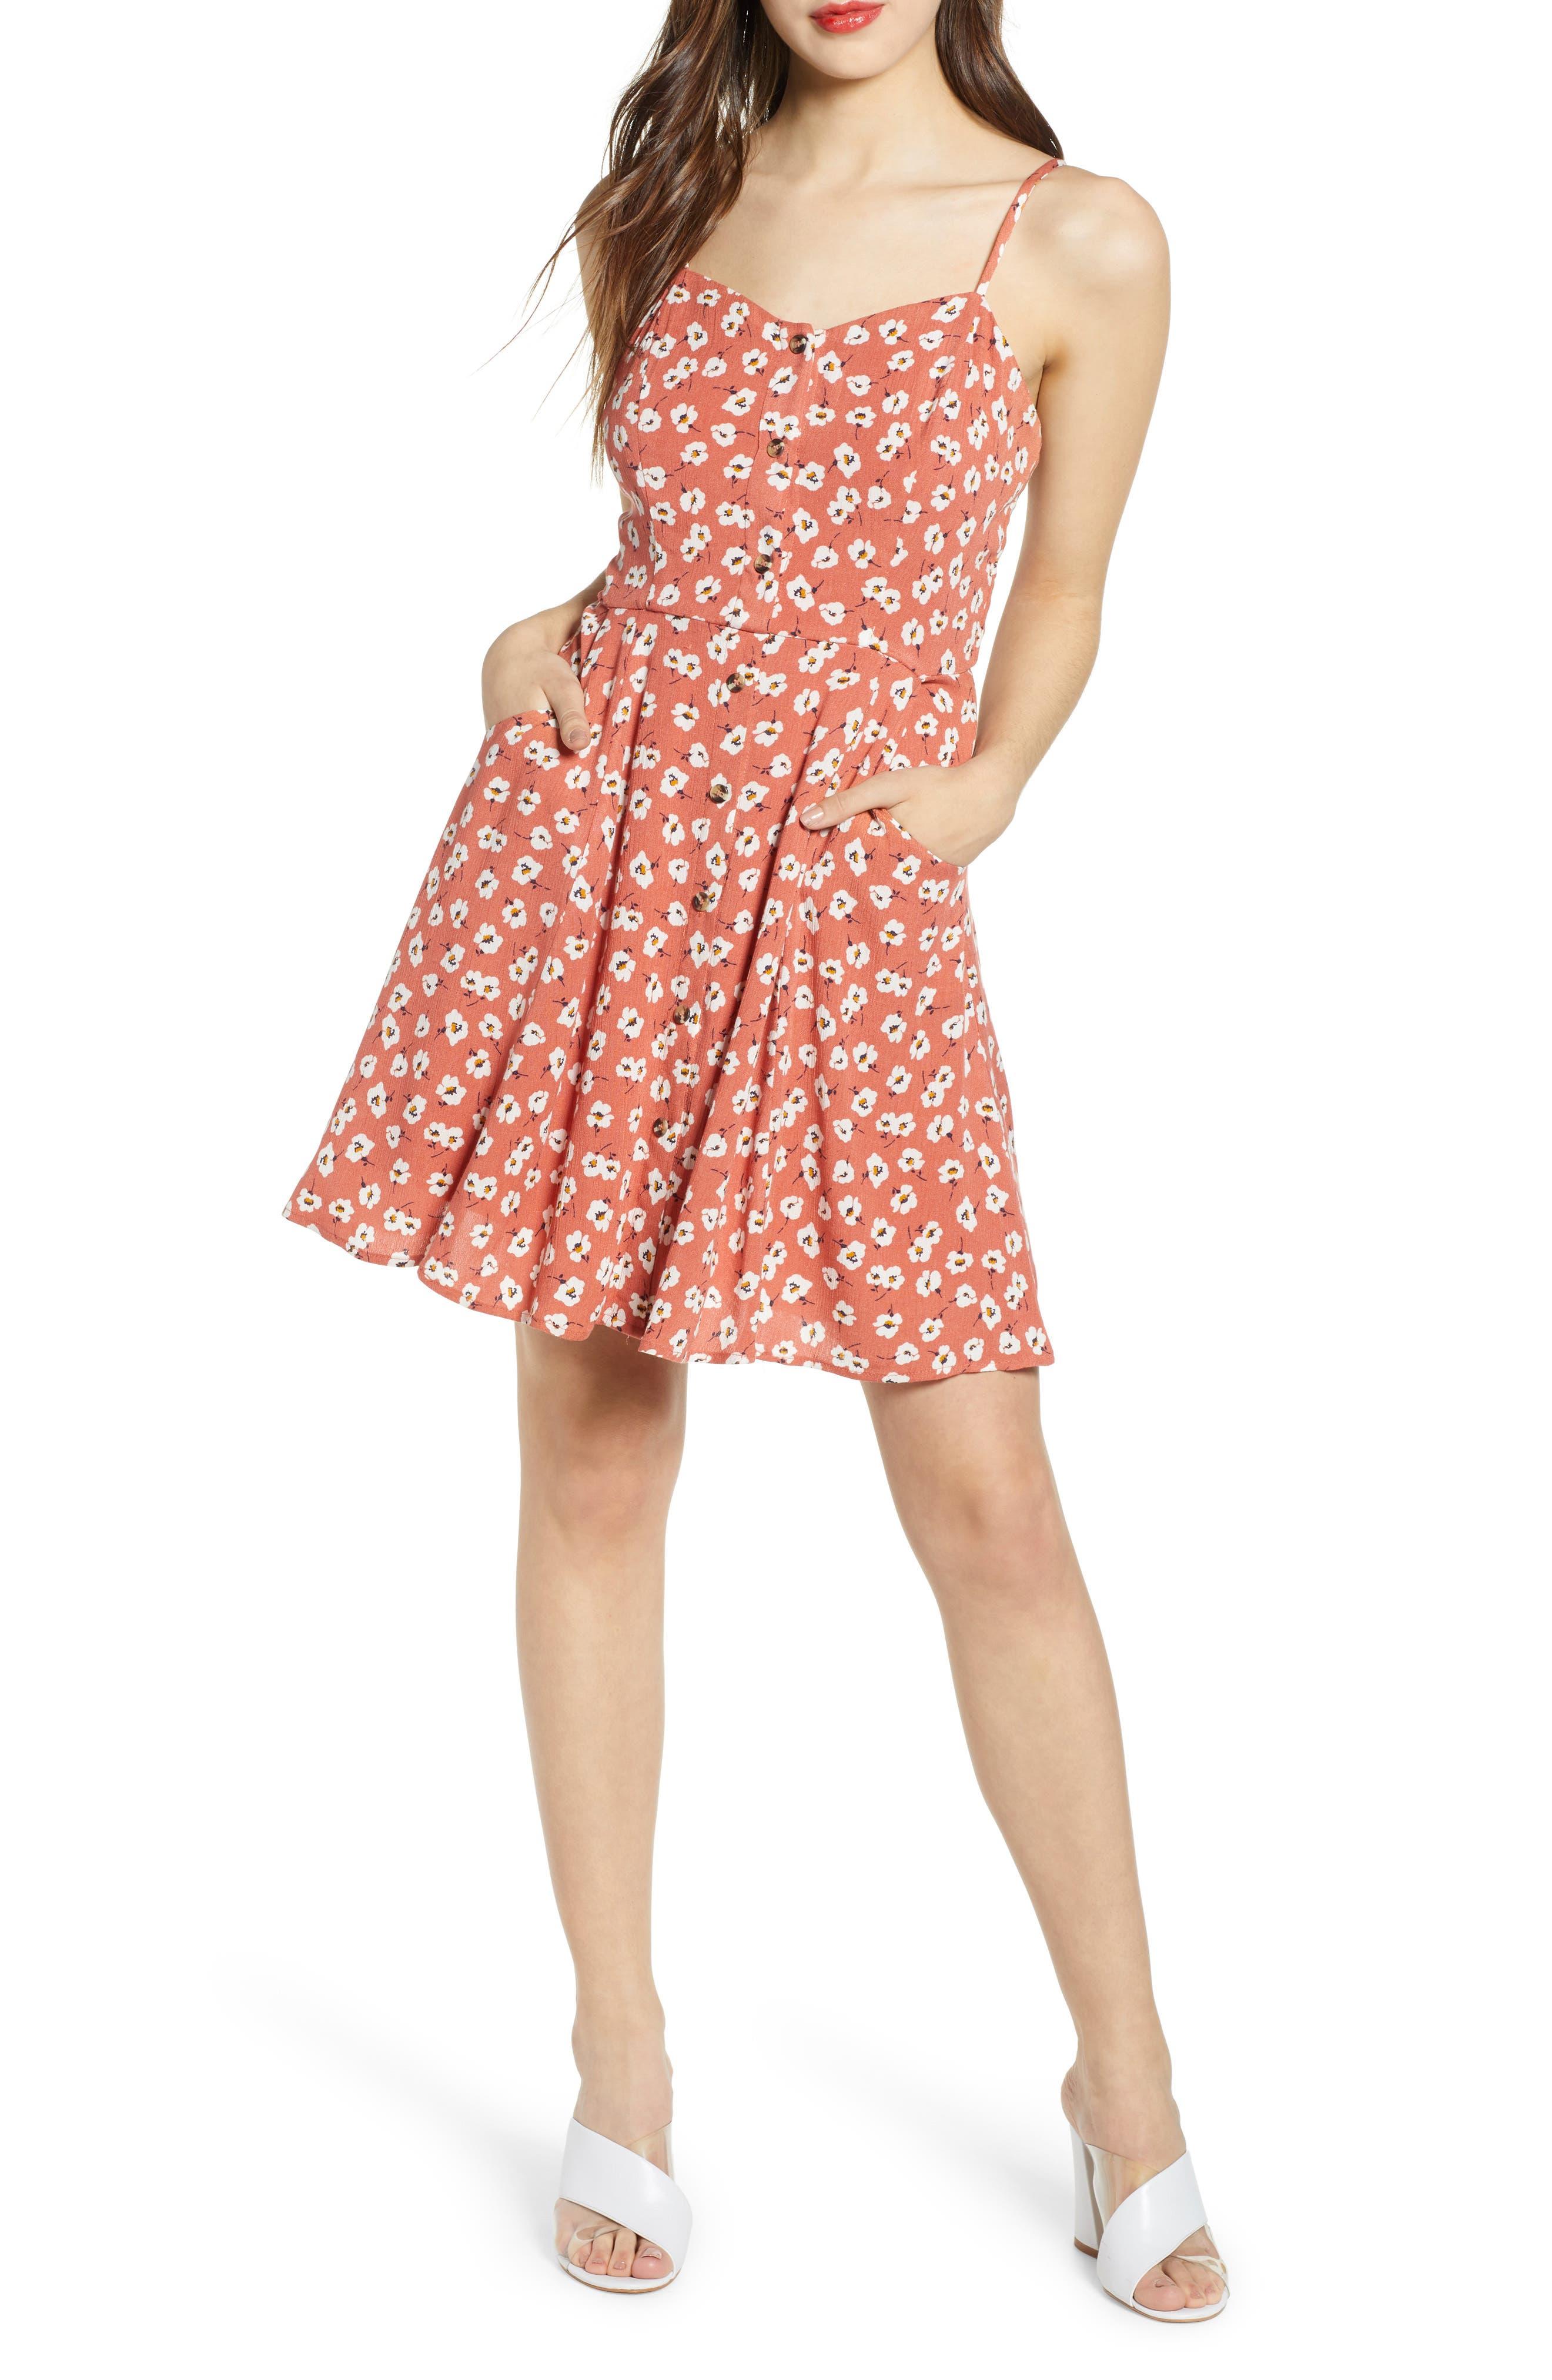 Love, Nickie Lew Floral Print Skater Dress, Coral